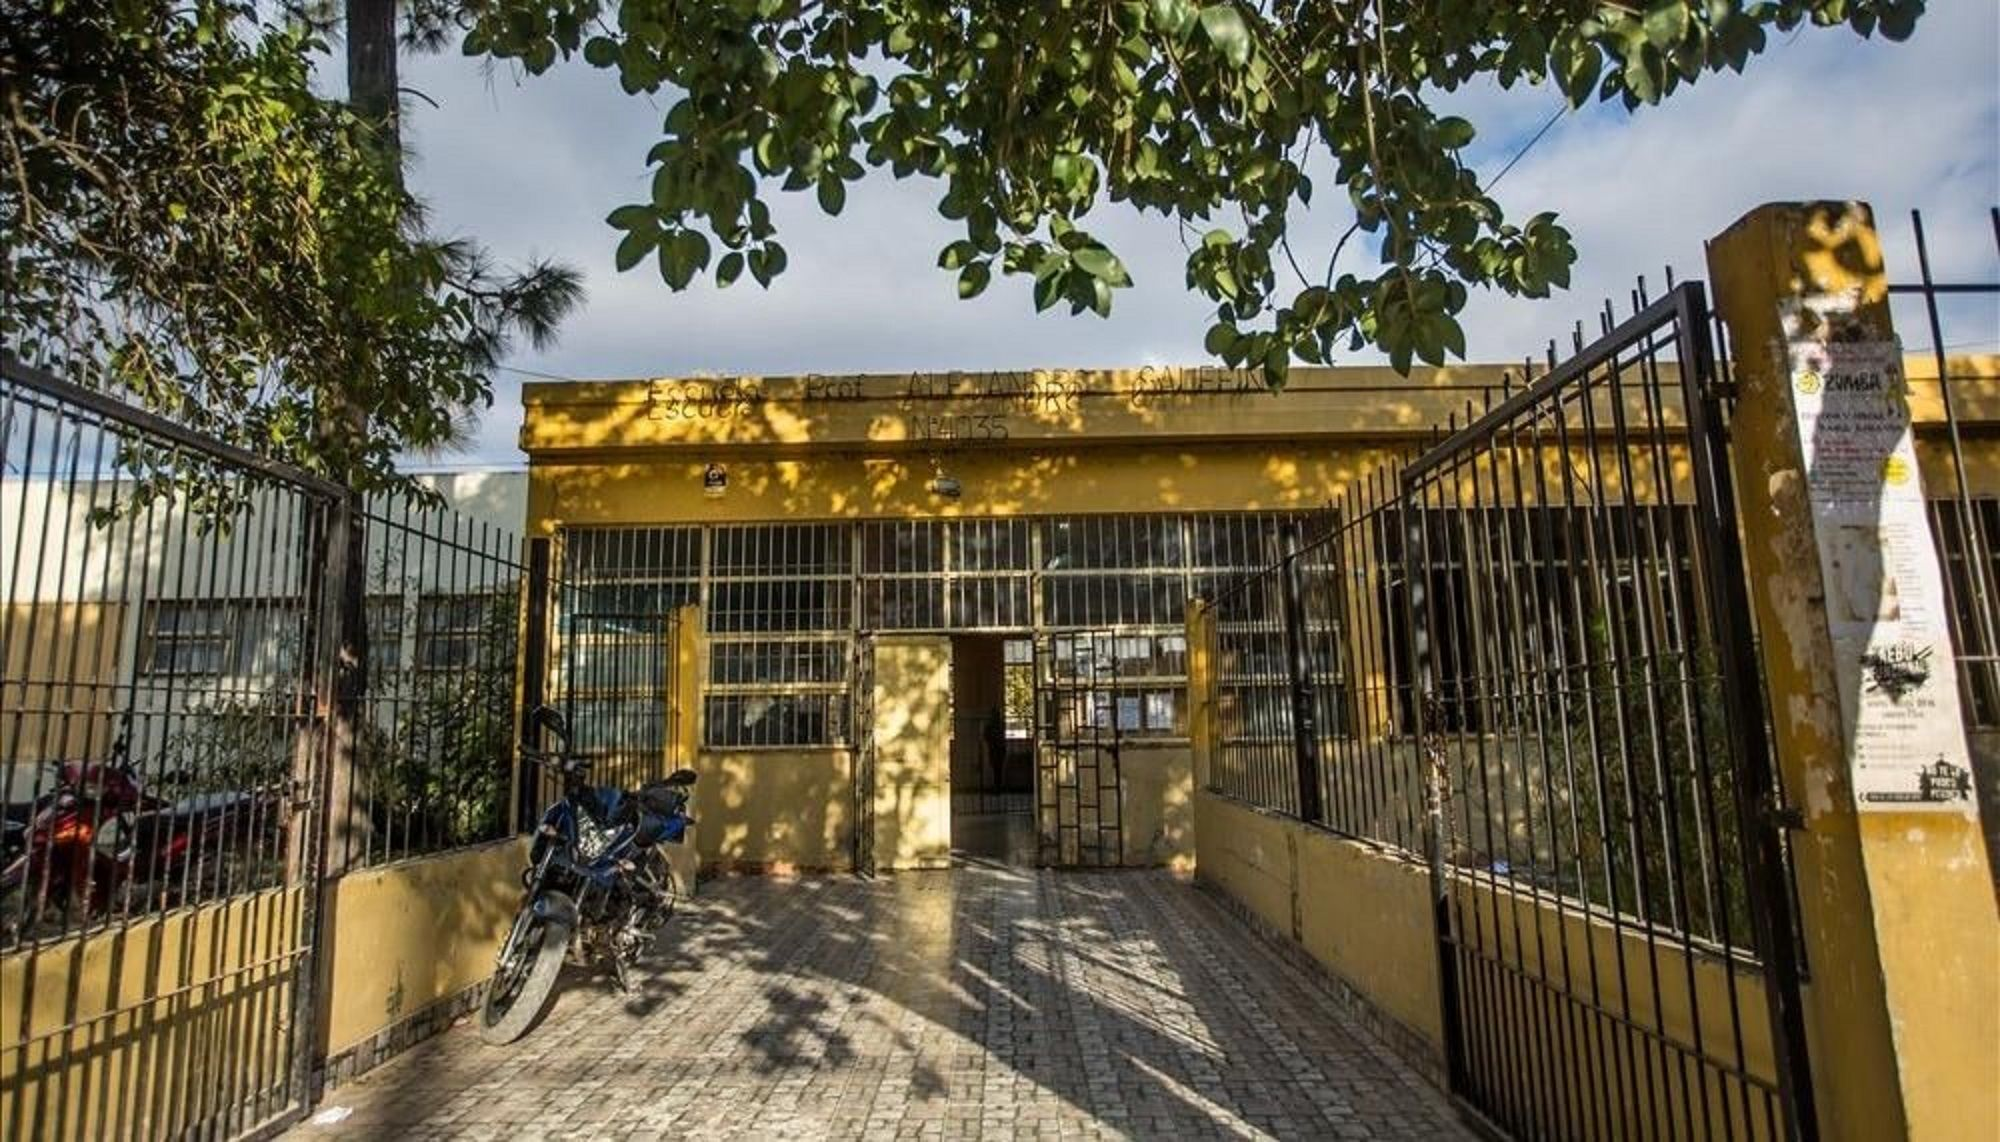 EscuelaAlejandro Gauffín